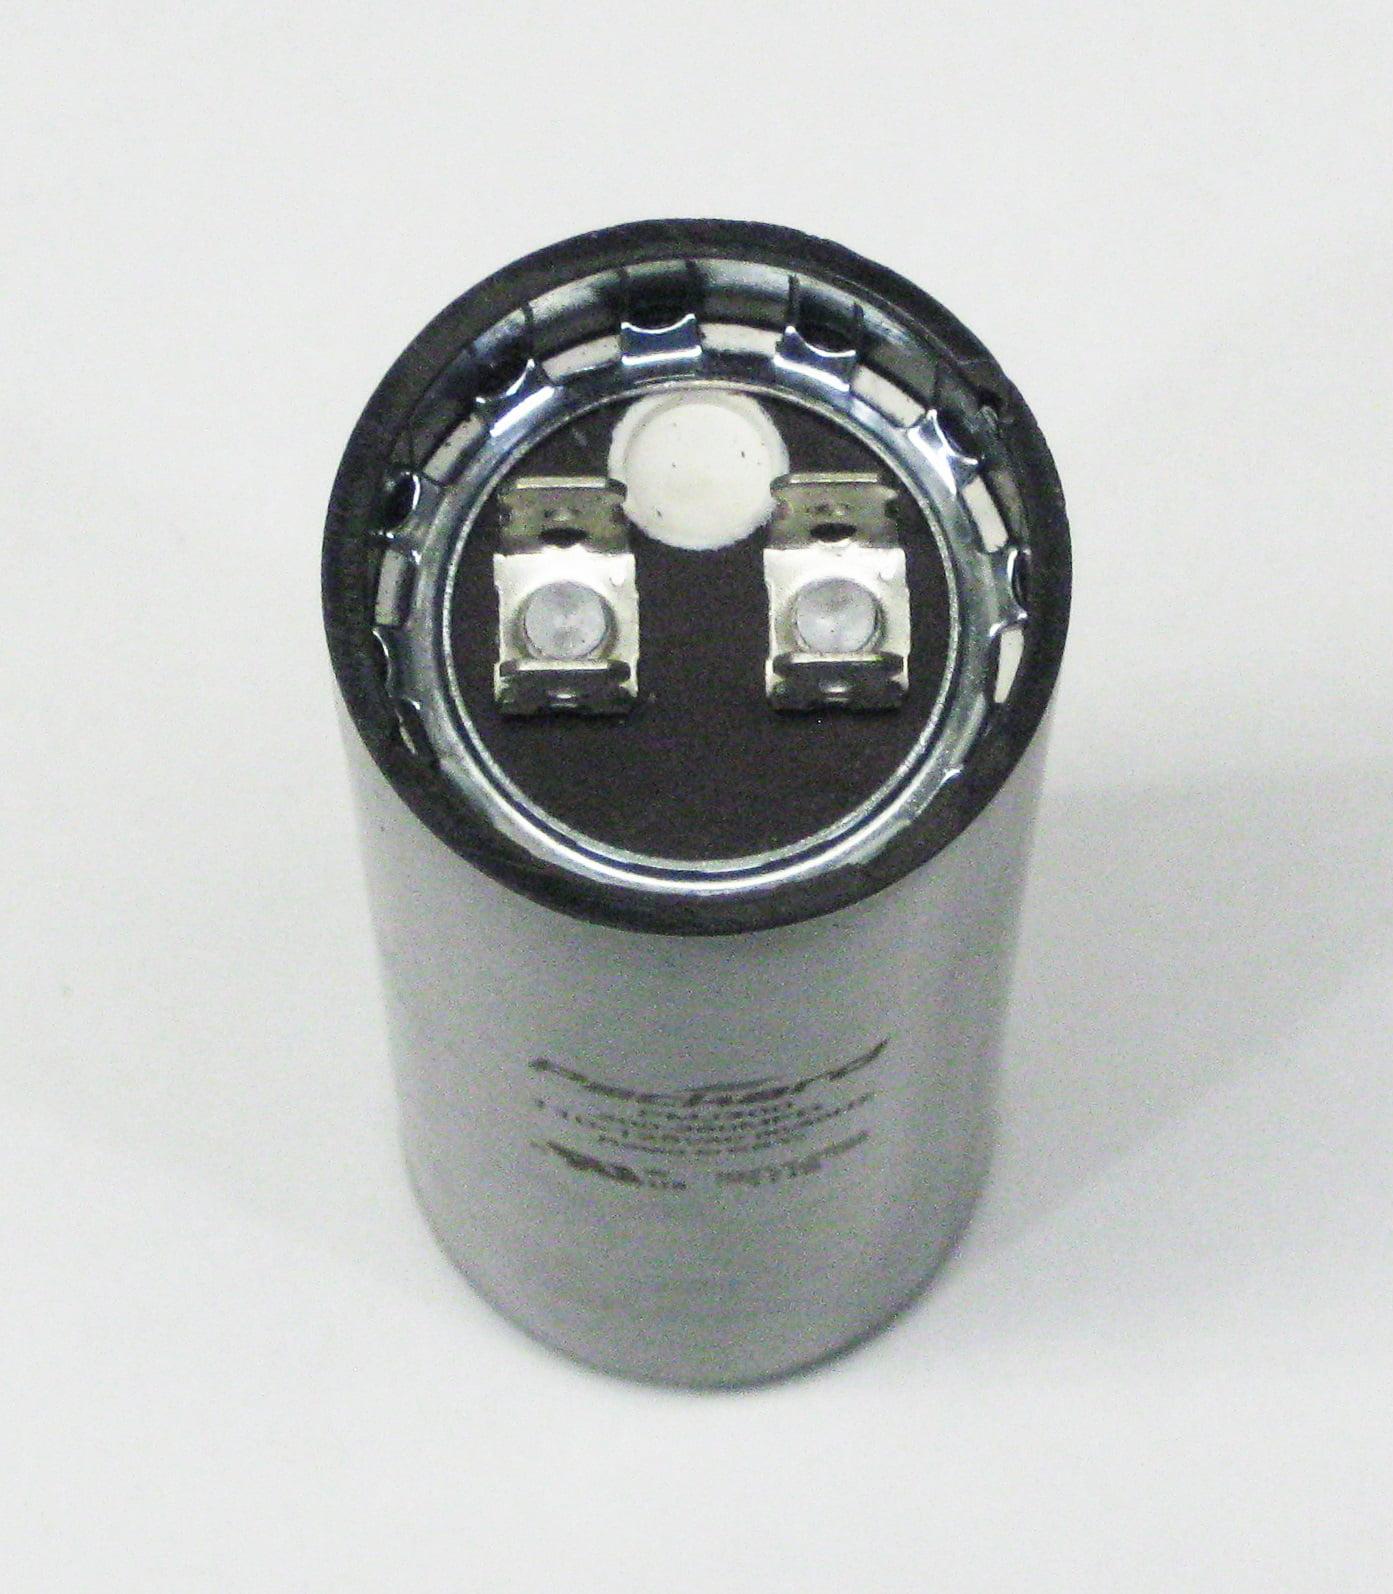 50//60Hz 110-125VAC 300-360 uF Vanguard BC-300 Electric Motor Start Capacitor